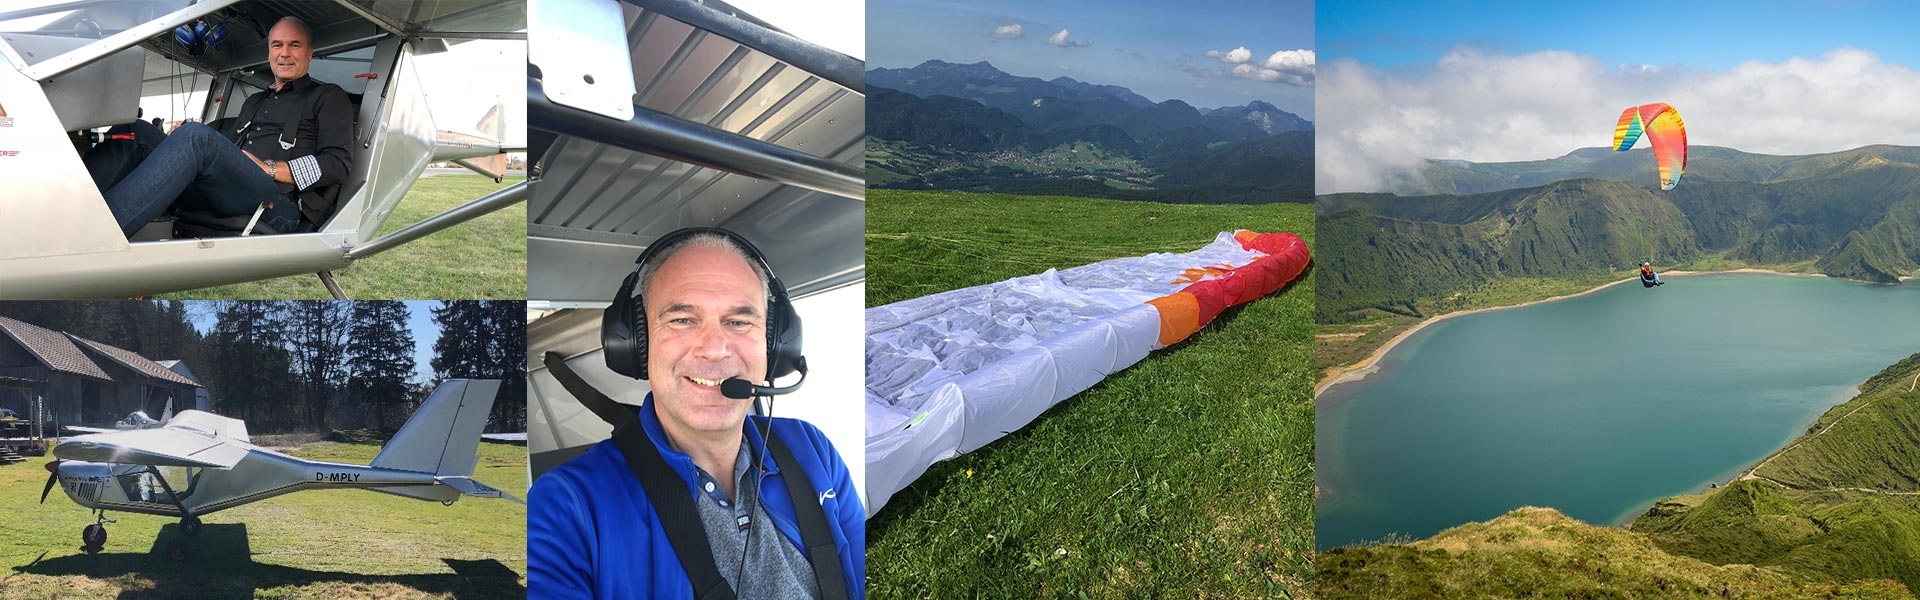 Der Pilot des Ultraleichtflugzeuges: Michael Emde